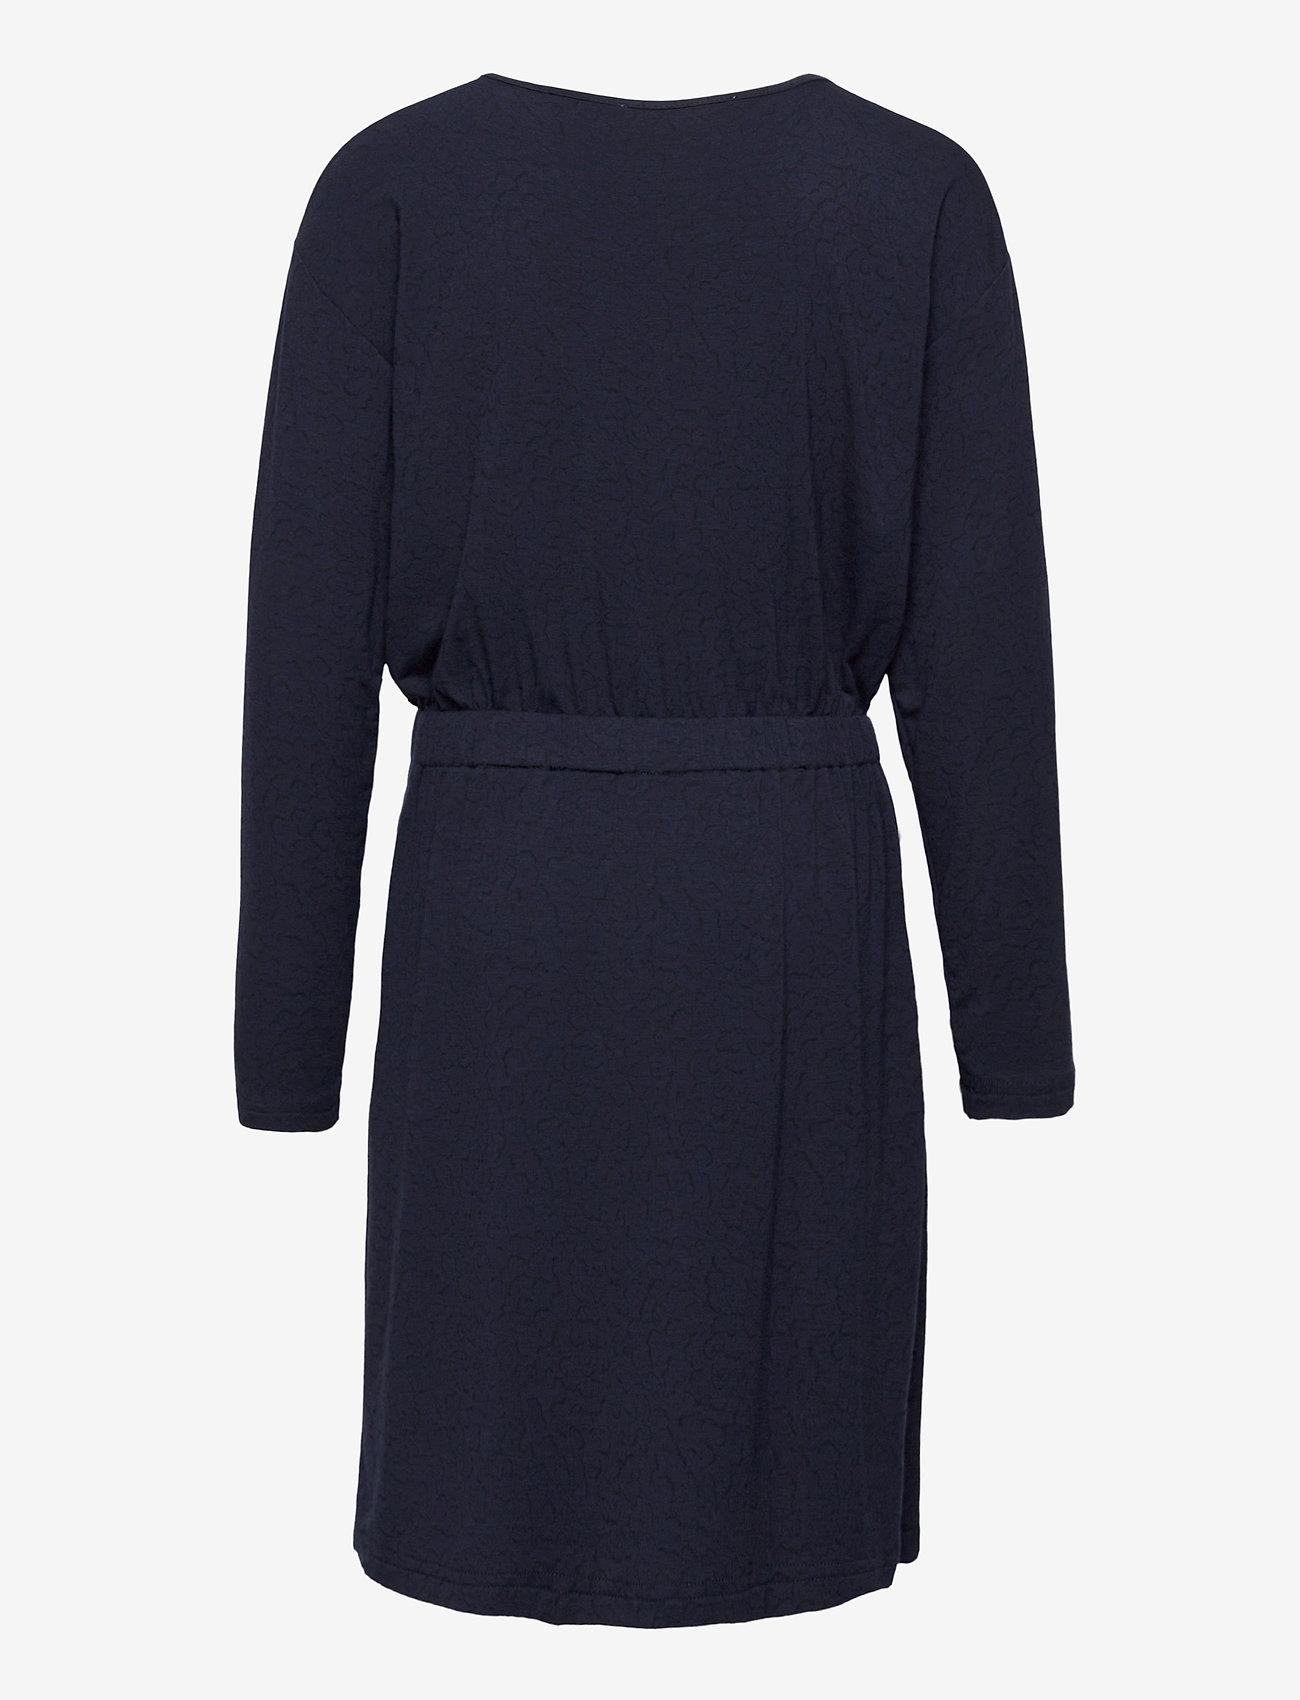 Rosemunde Kids - Dress ls - robes - blue whirlwind print - 1